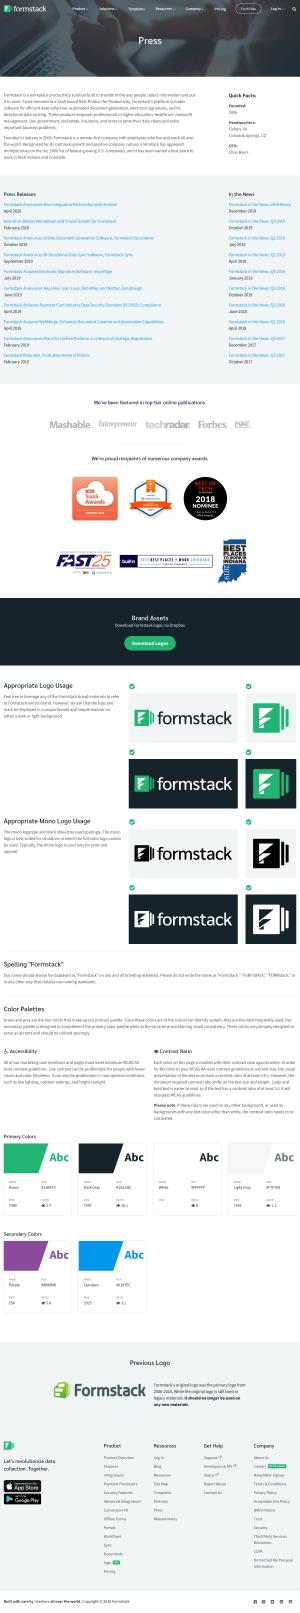 Formstack – Media kit page